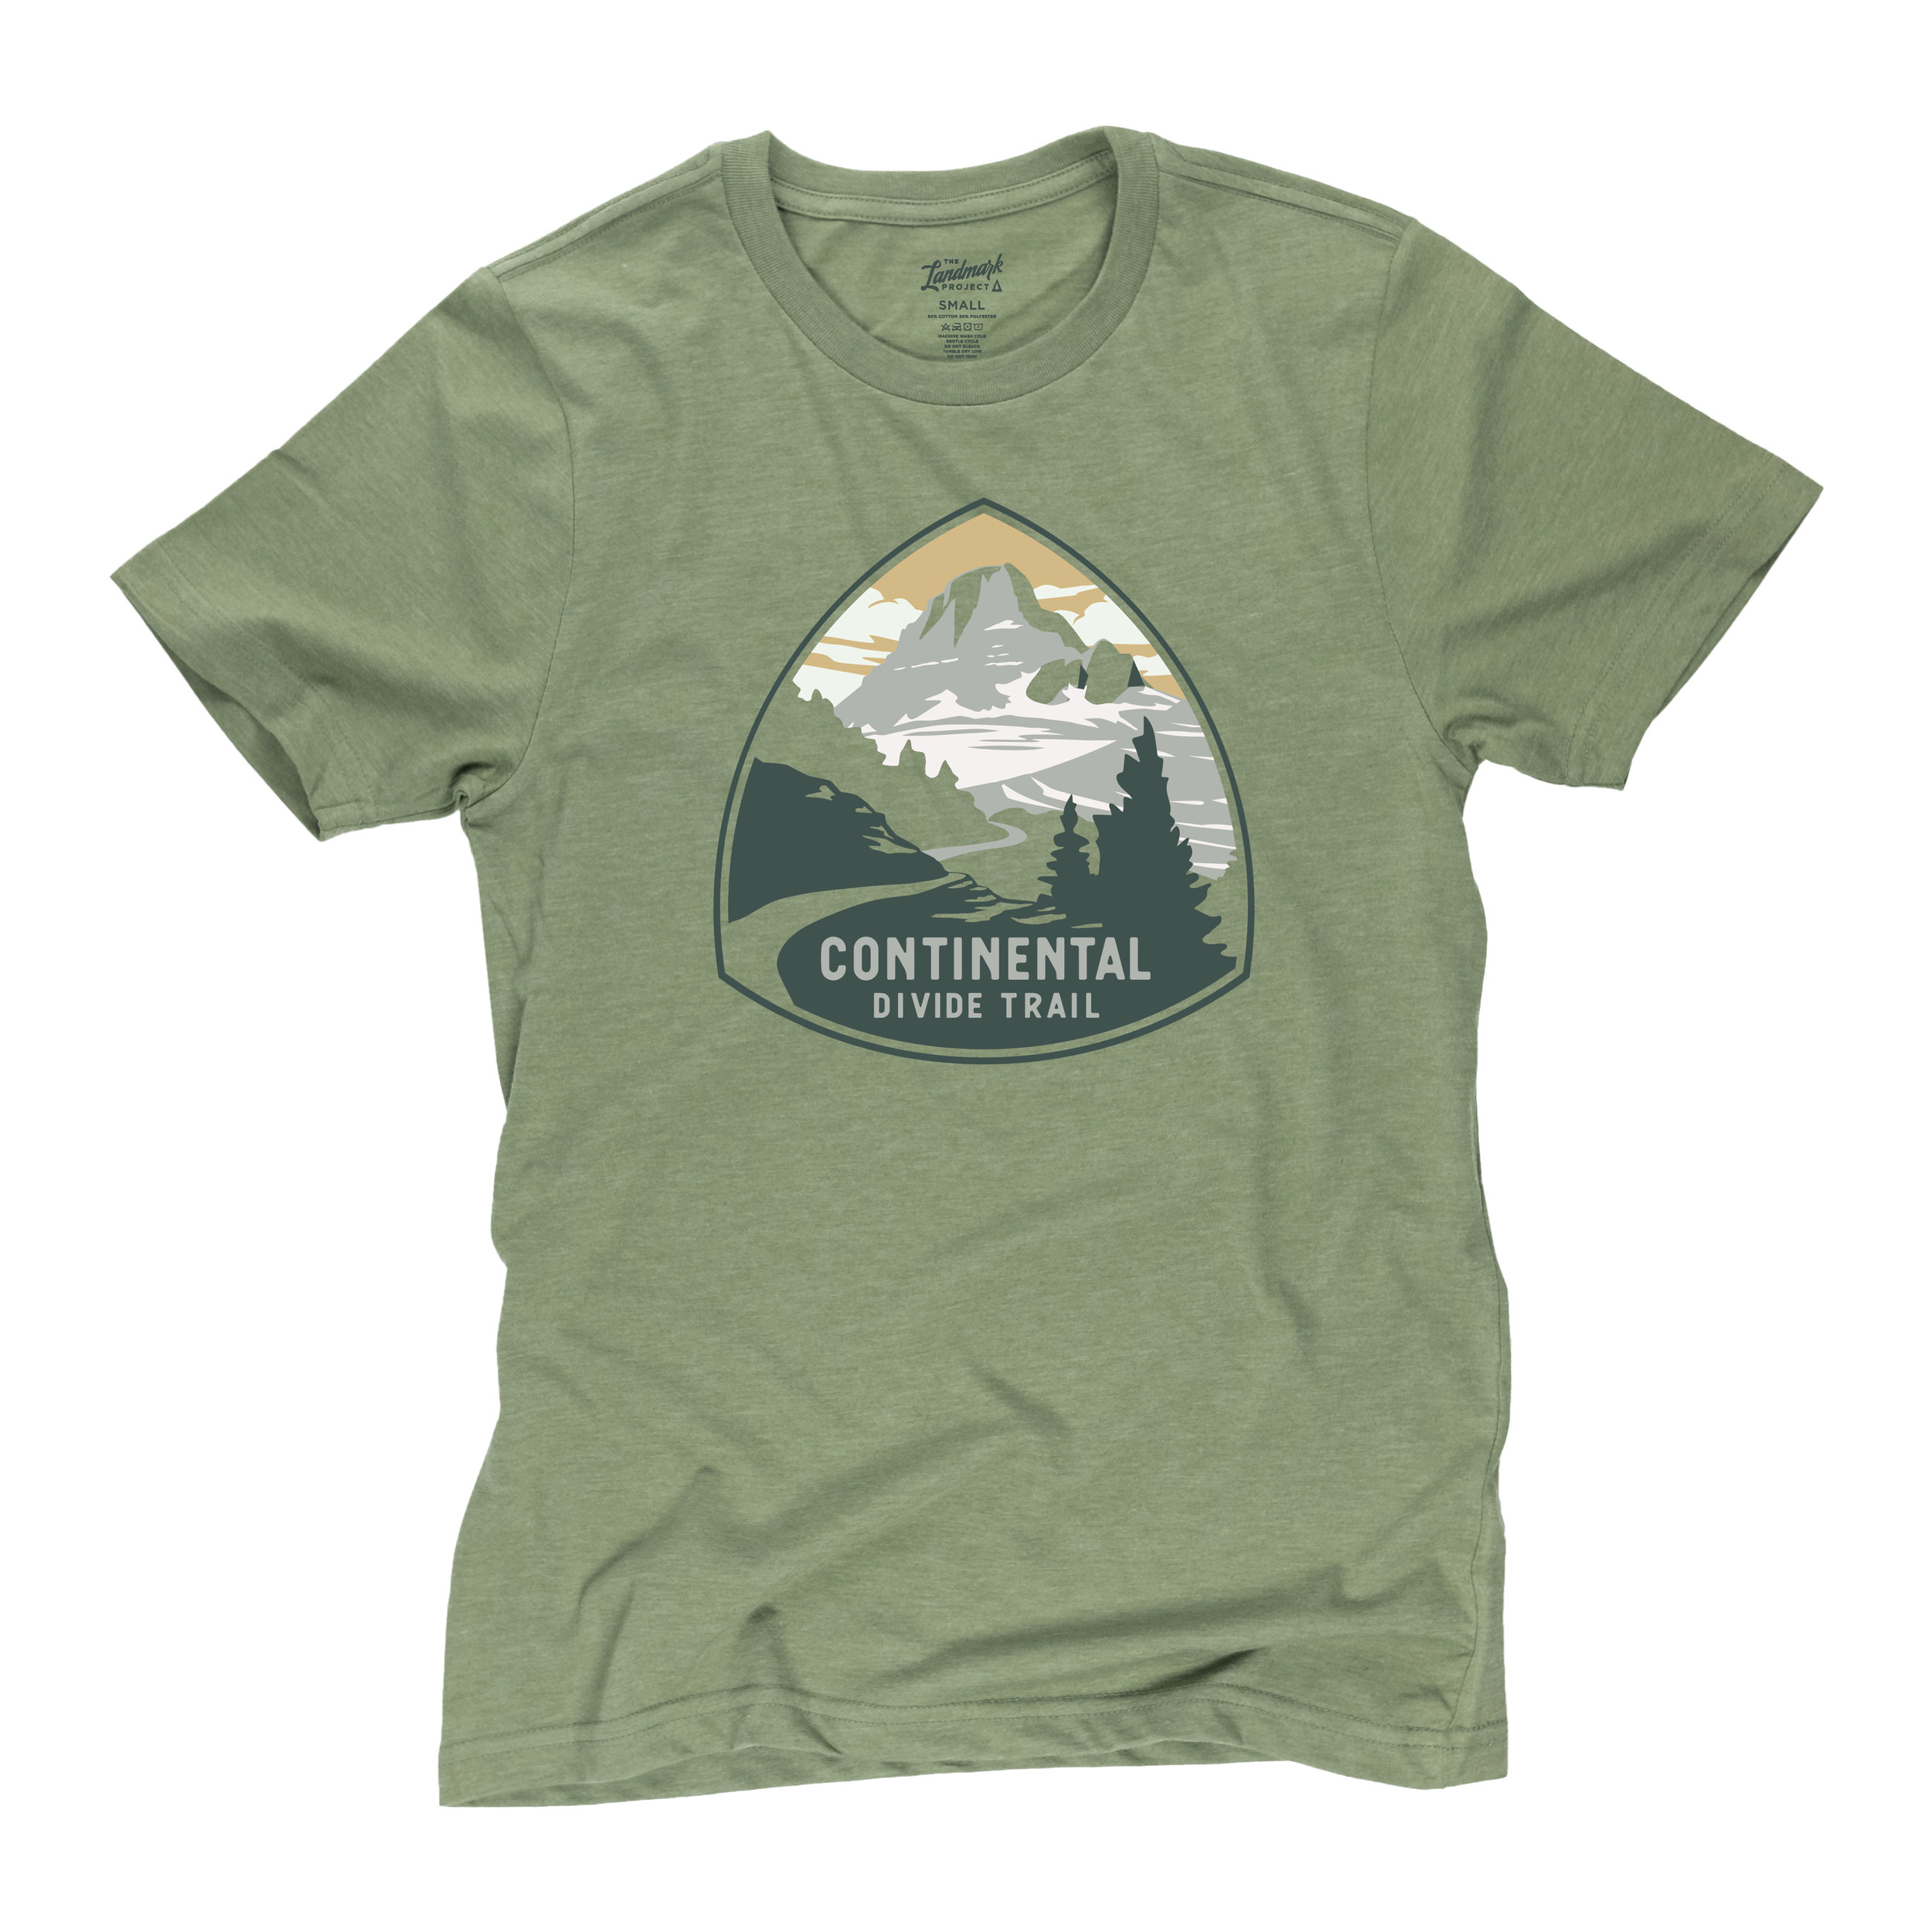 continental-divide-trail-cactus.jpg